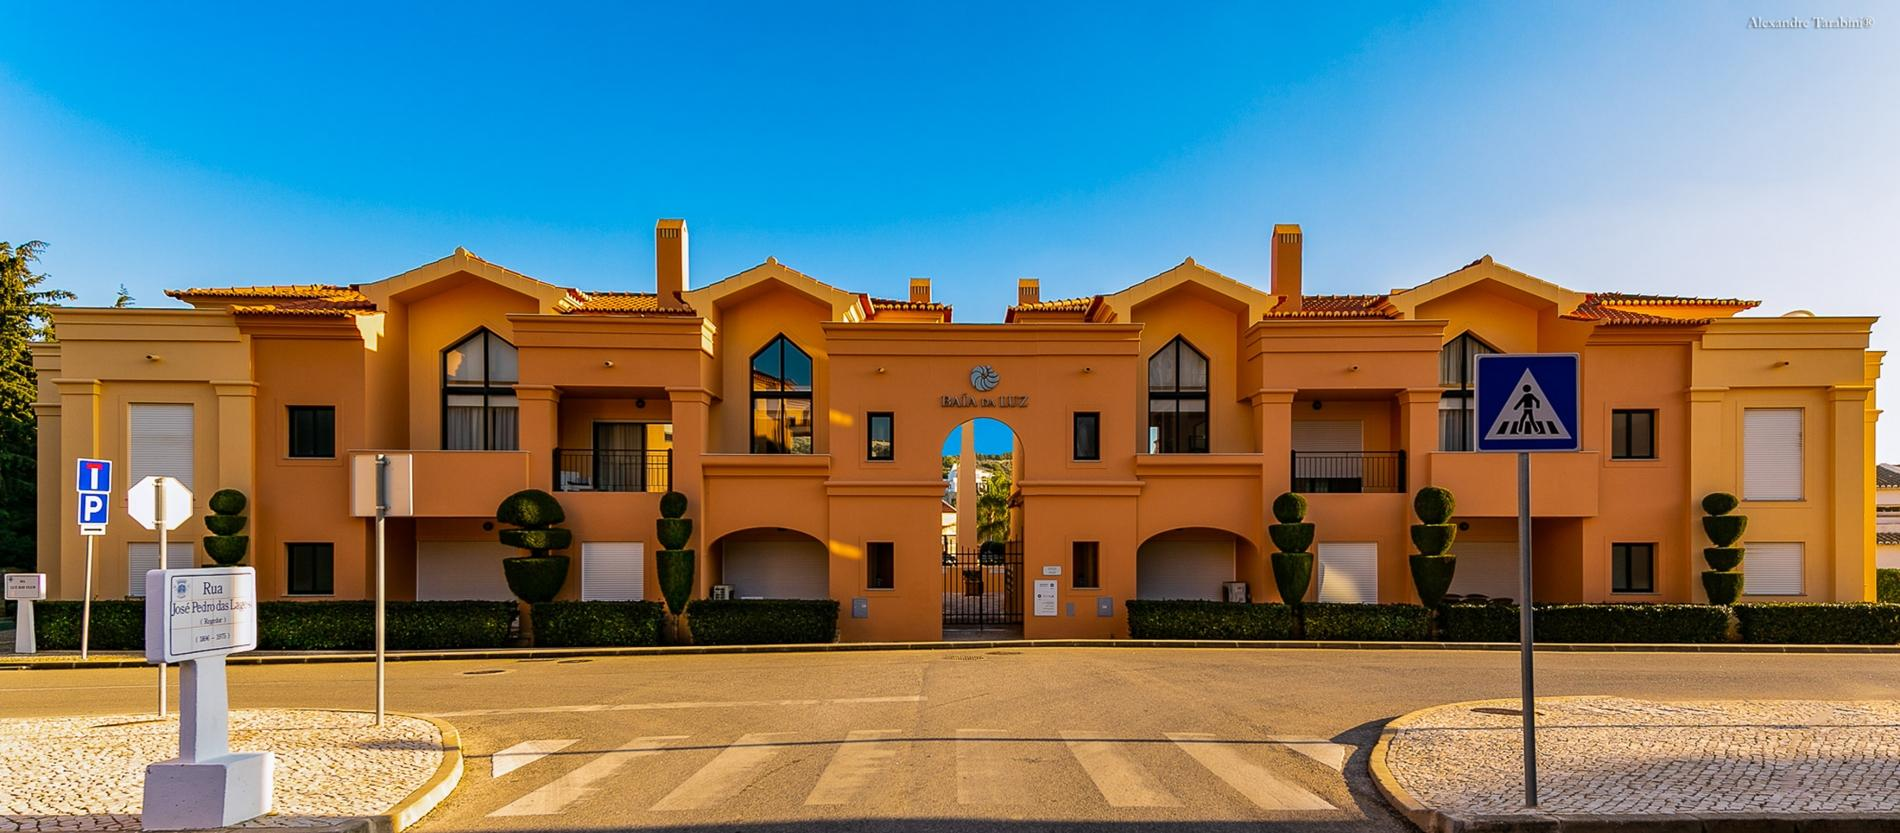 Ferienwohnung A24 - LuzBay Beach Apartment (2558091), Luz, , Algarve, Portugal, Bild 21